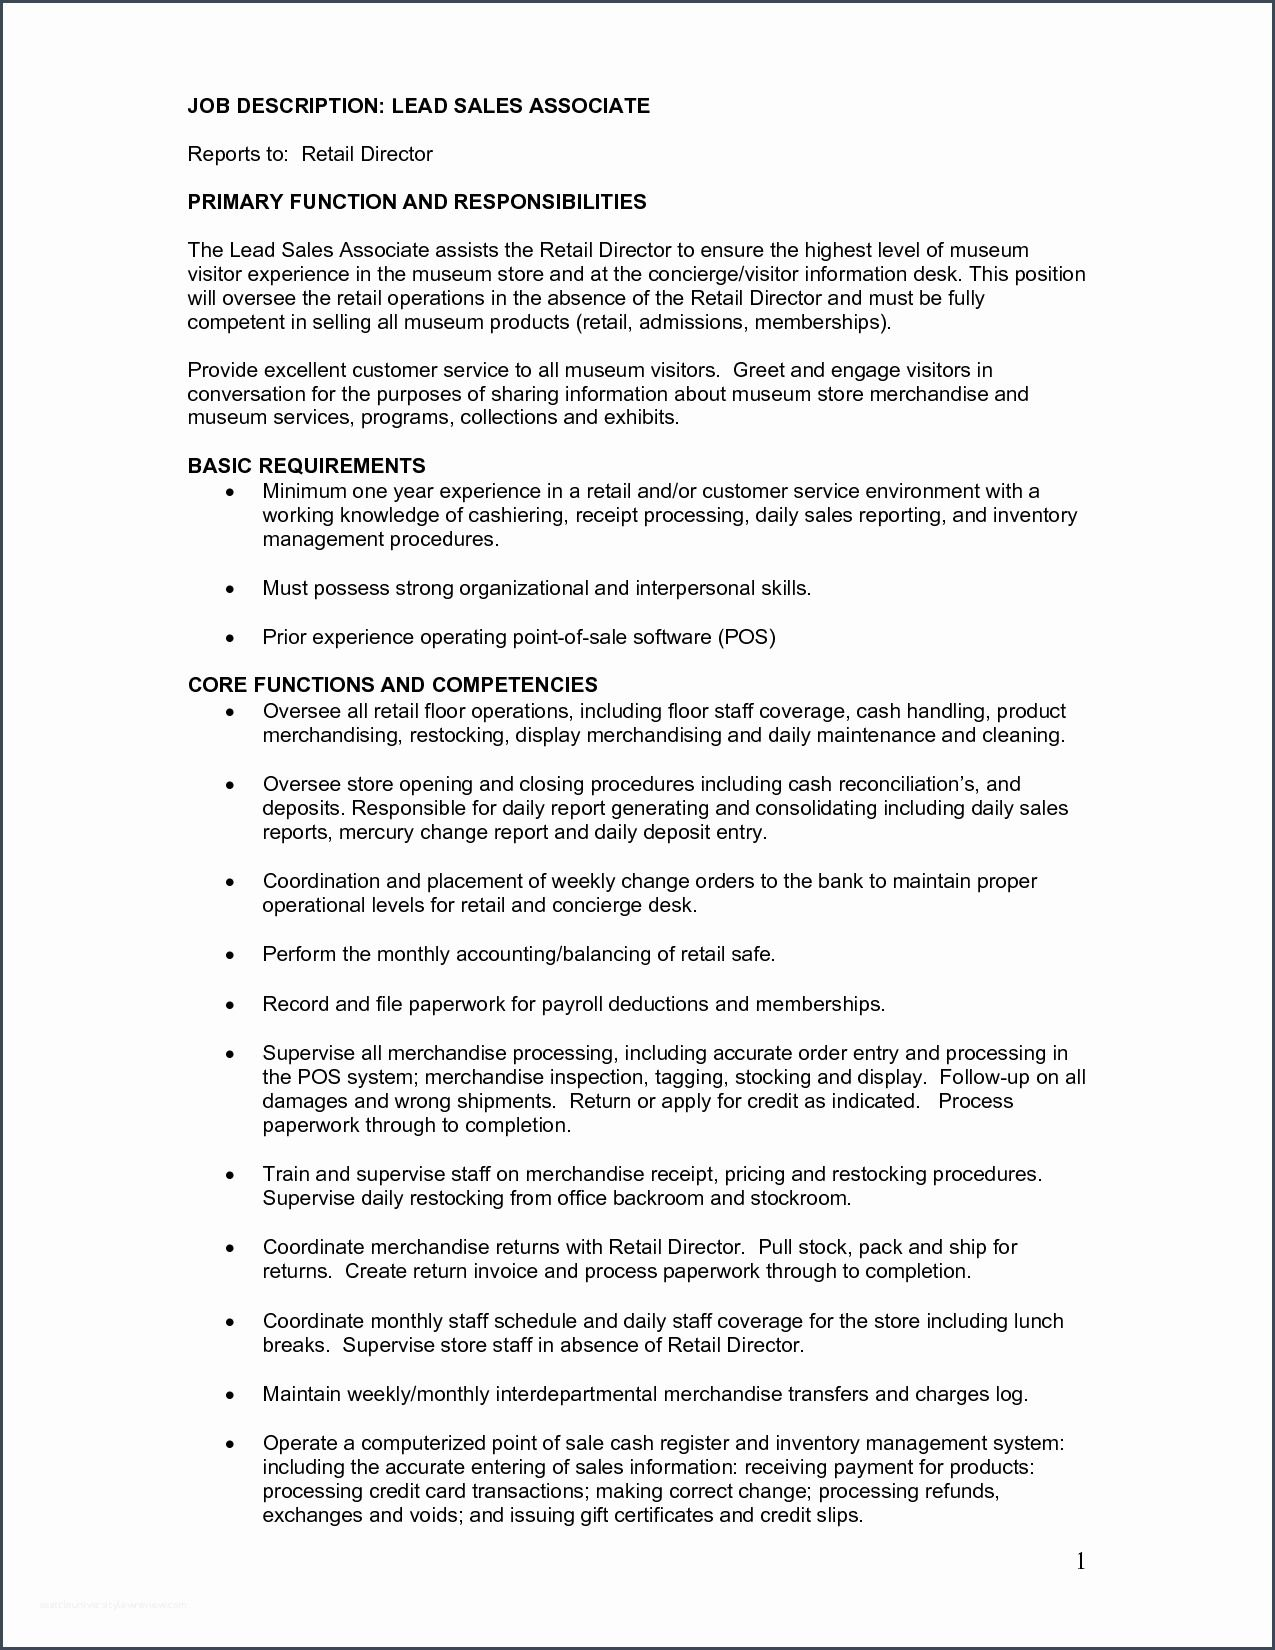 coolsales associate job descriptions for resume